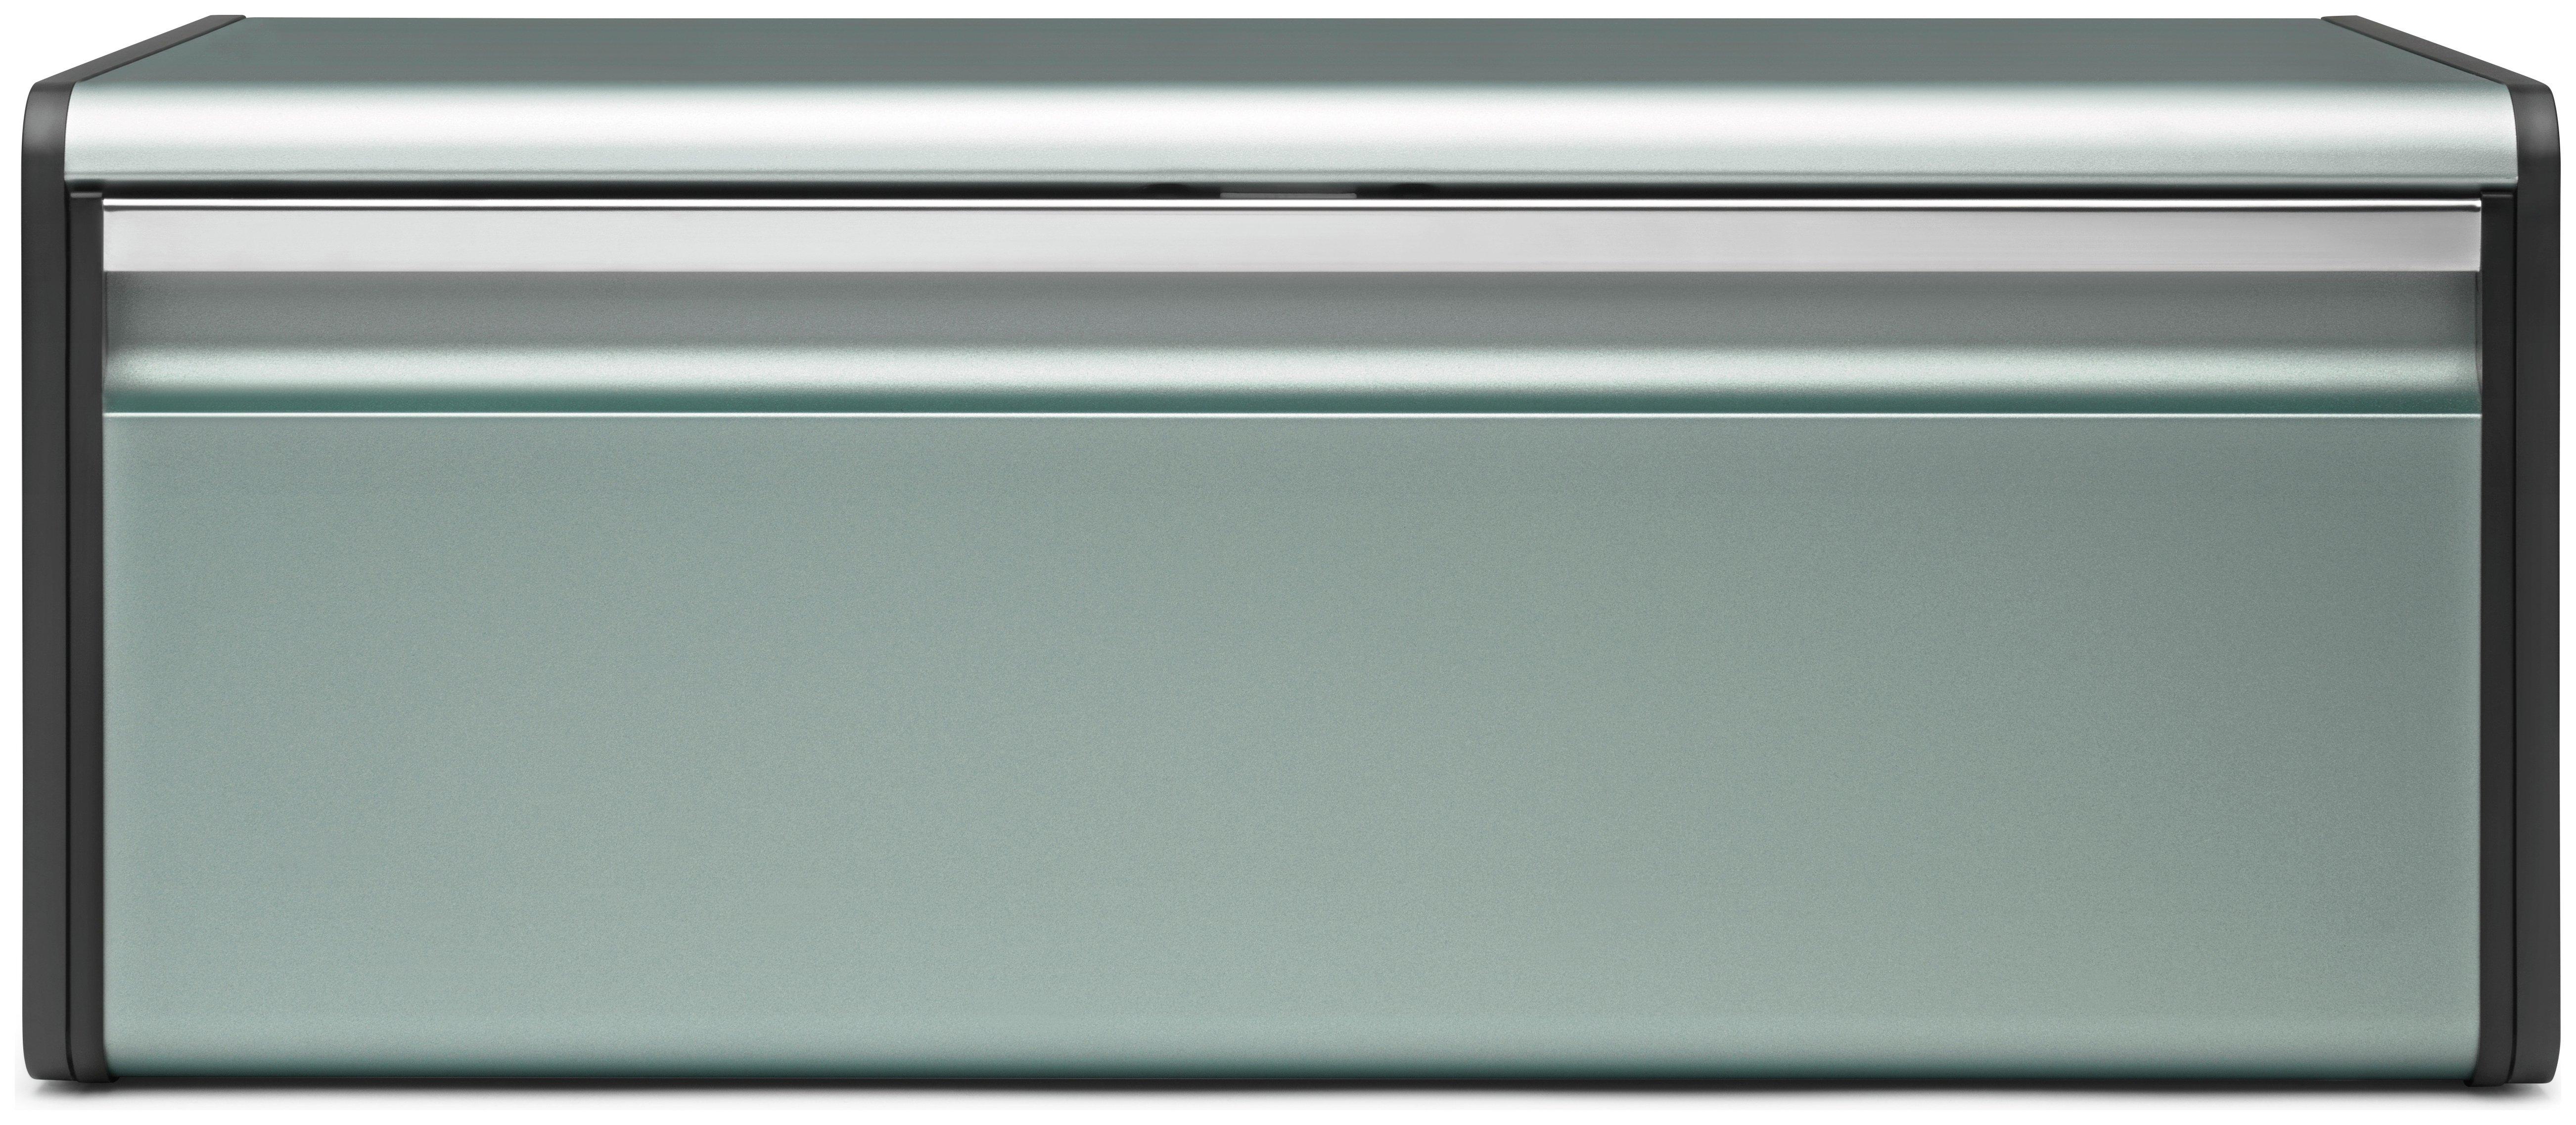 Image of Brabantia - Fall Front Bread Bin - Metallic Mint